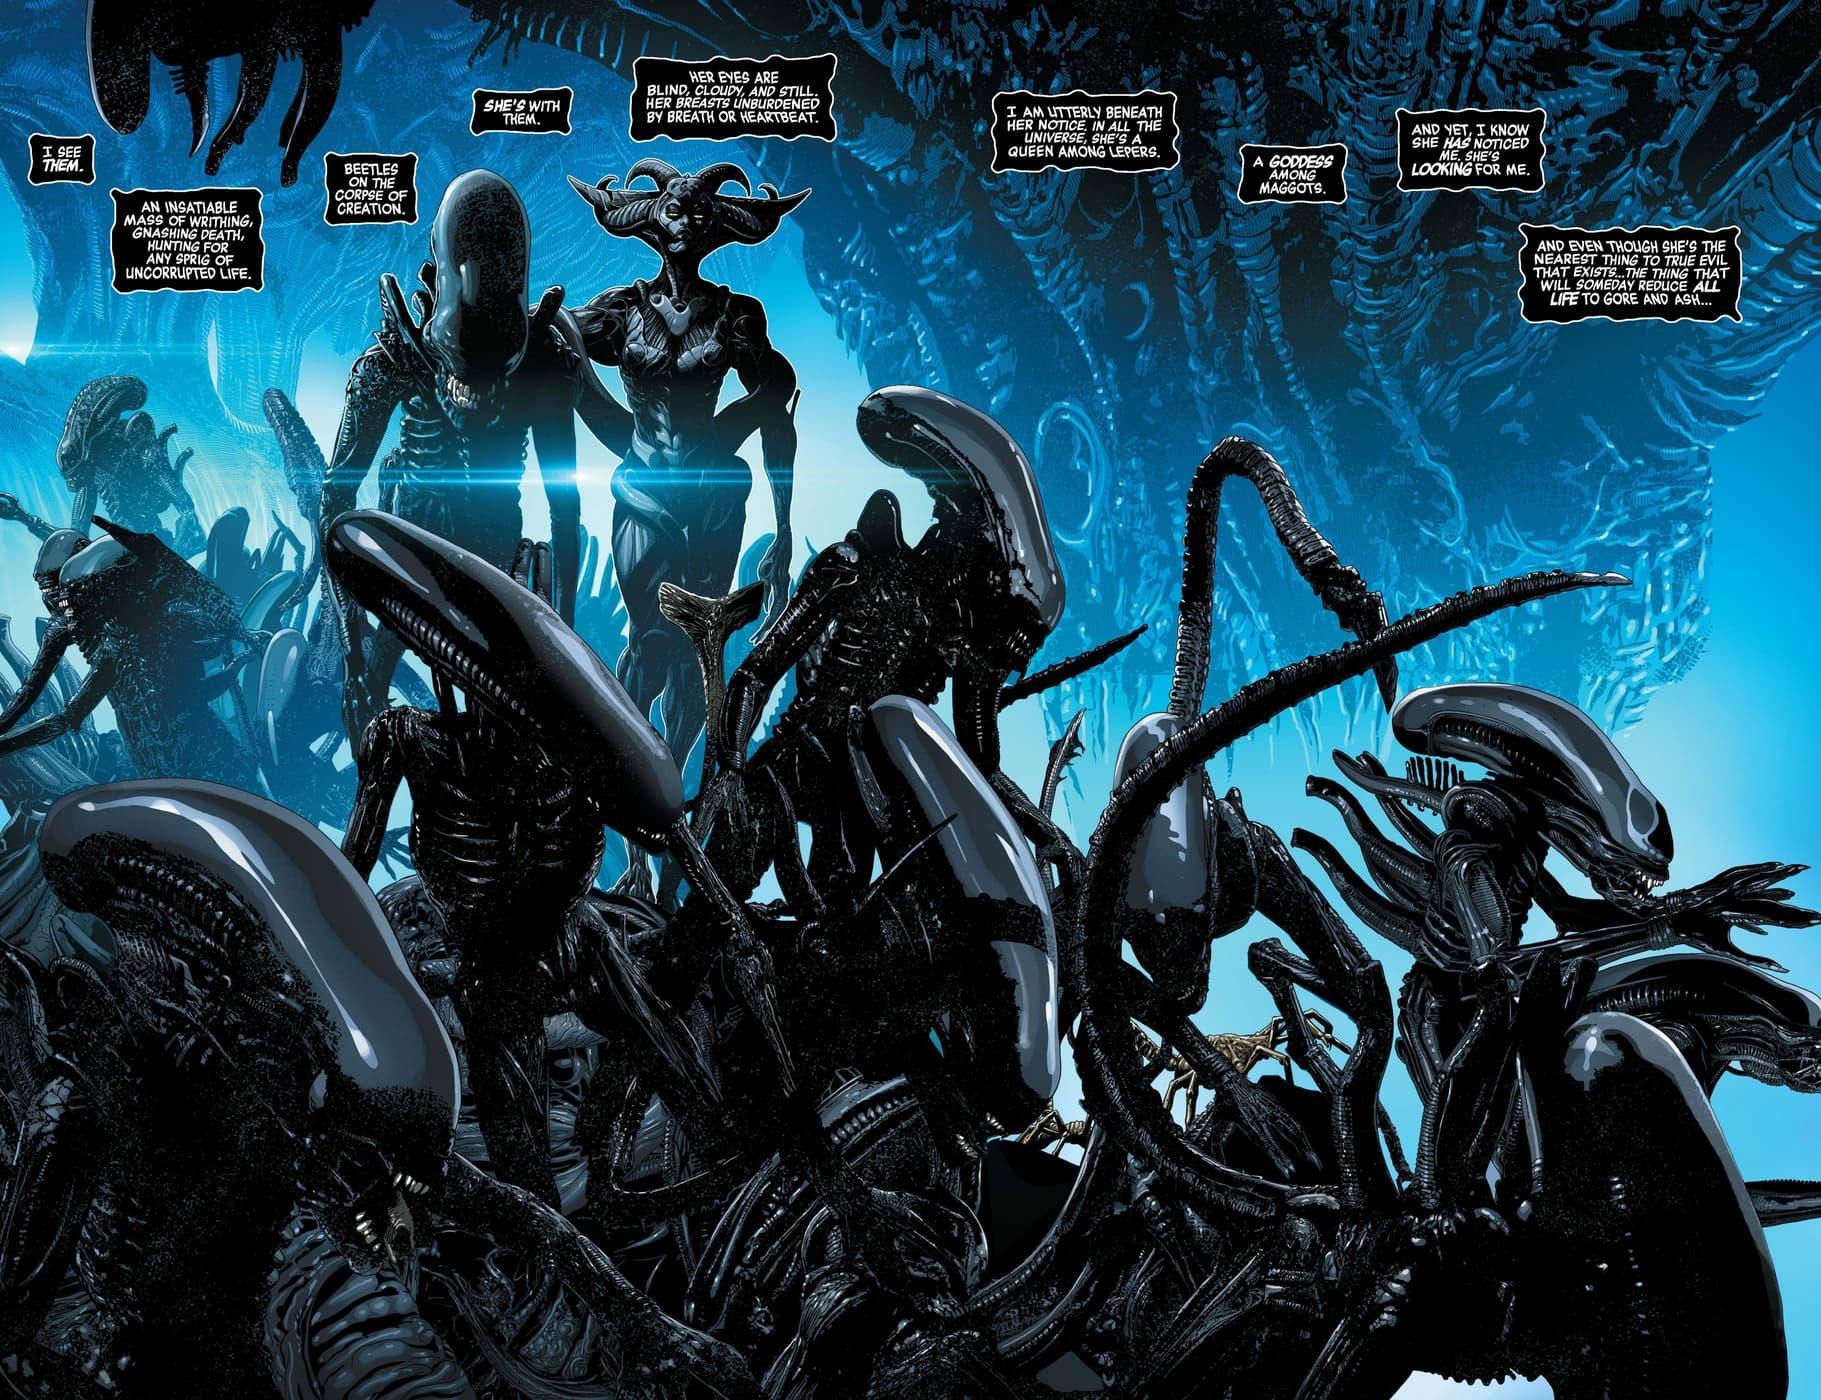 The Xenomorph swarm encroaches in Alien (2021) #1.